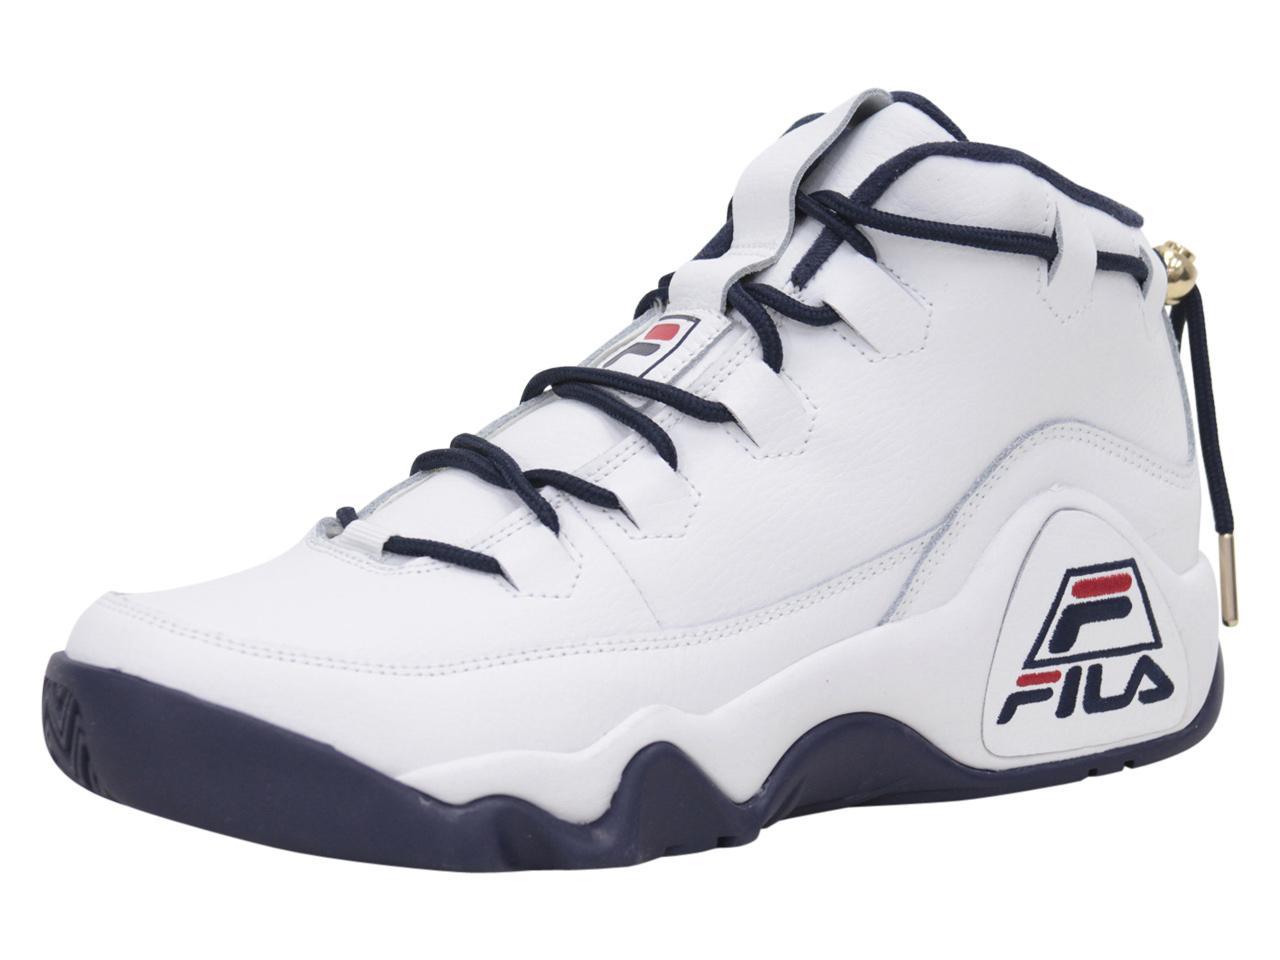 Fila Men's 95 Primo Sneakers Shoes